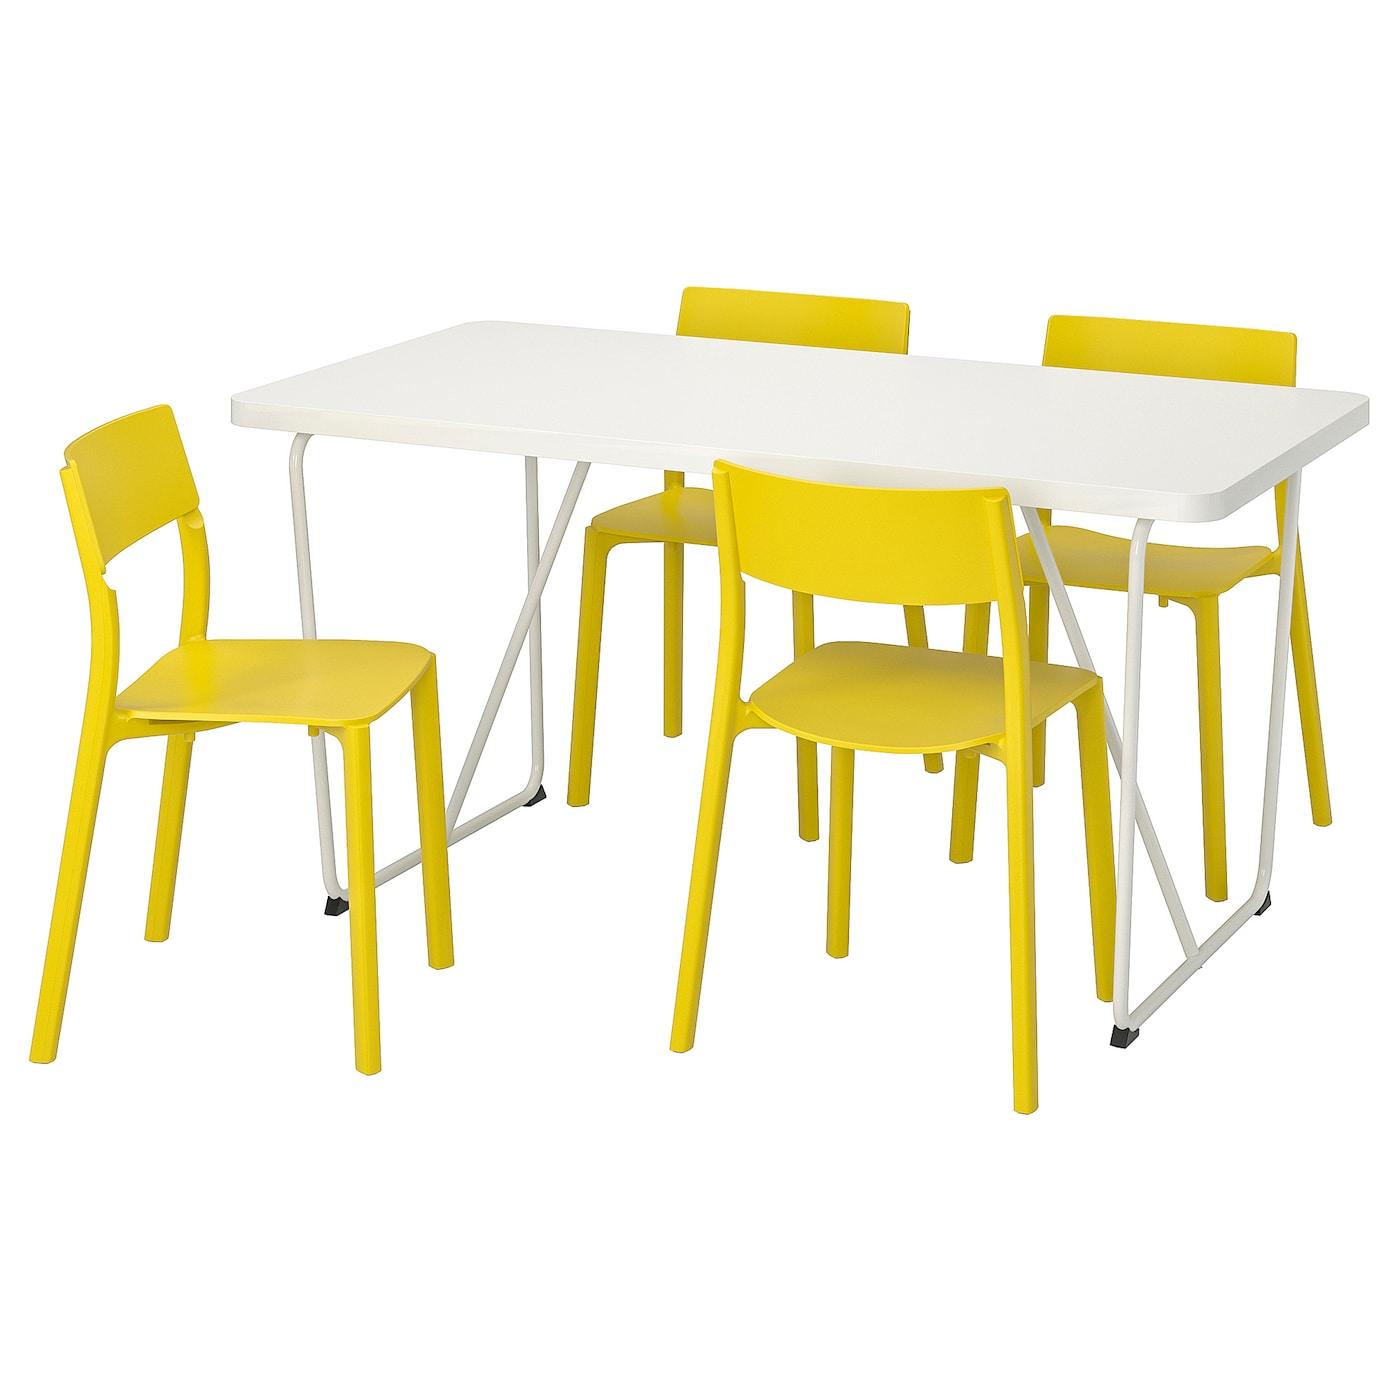 IKEA RYDEBÄCK/BACKARYD / JANINGE Stół i 4 krzesła, biały, żółty, 150 cm